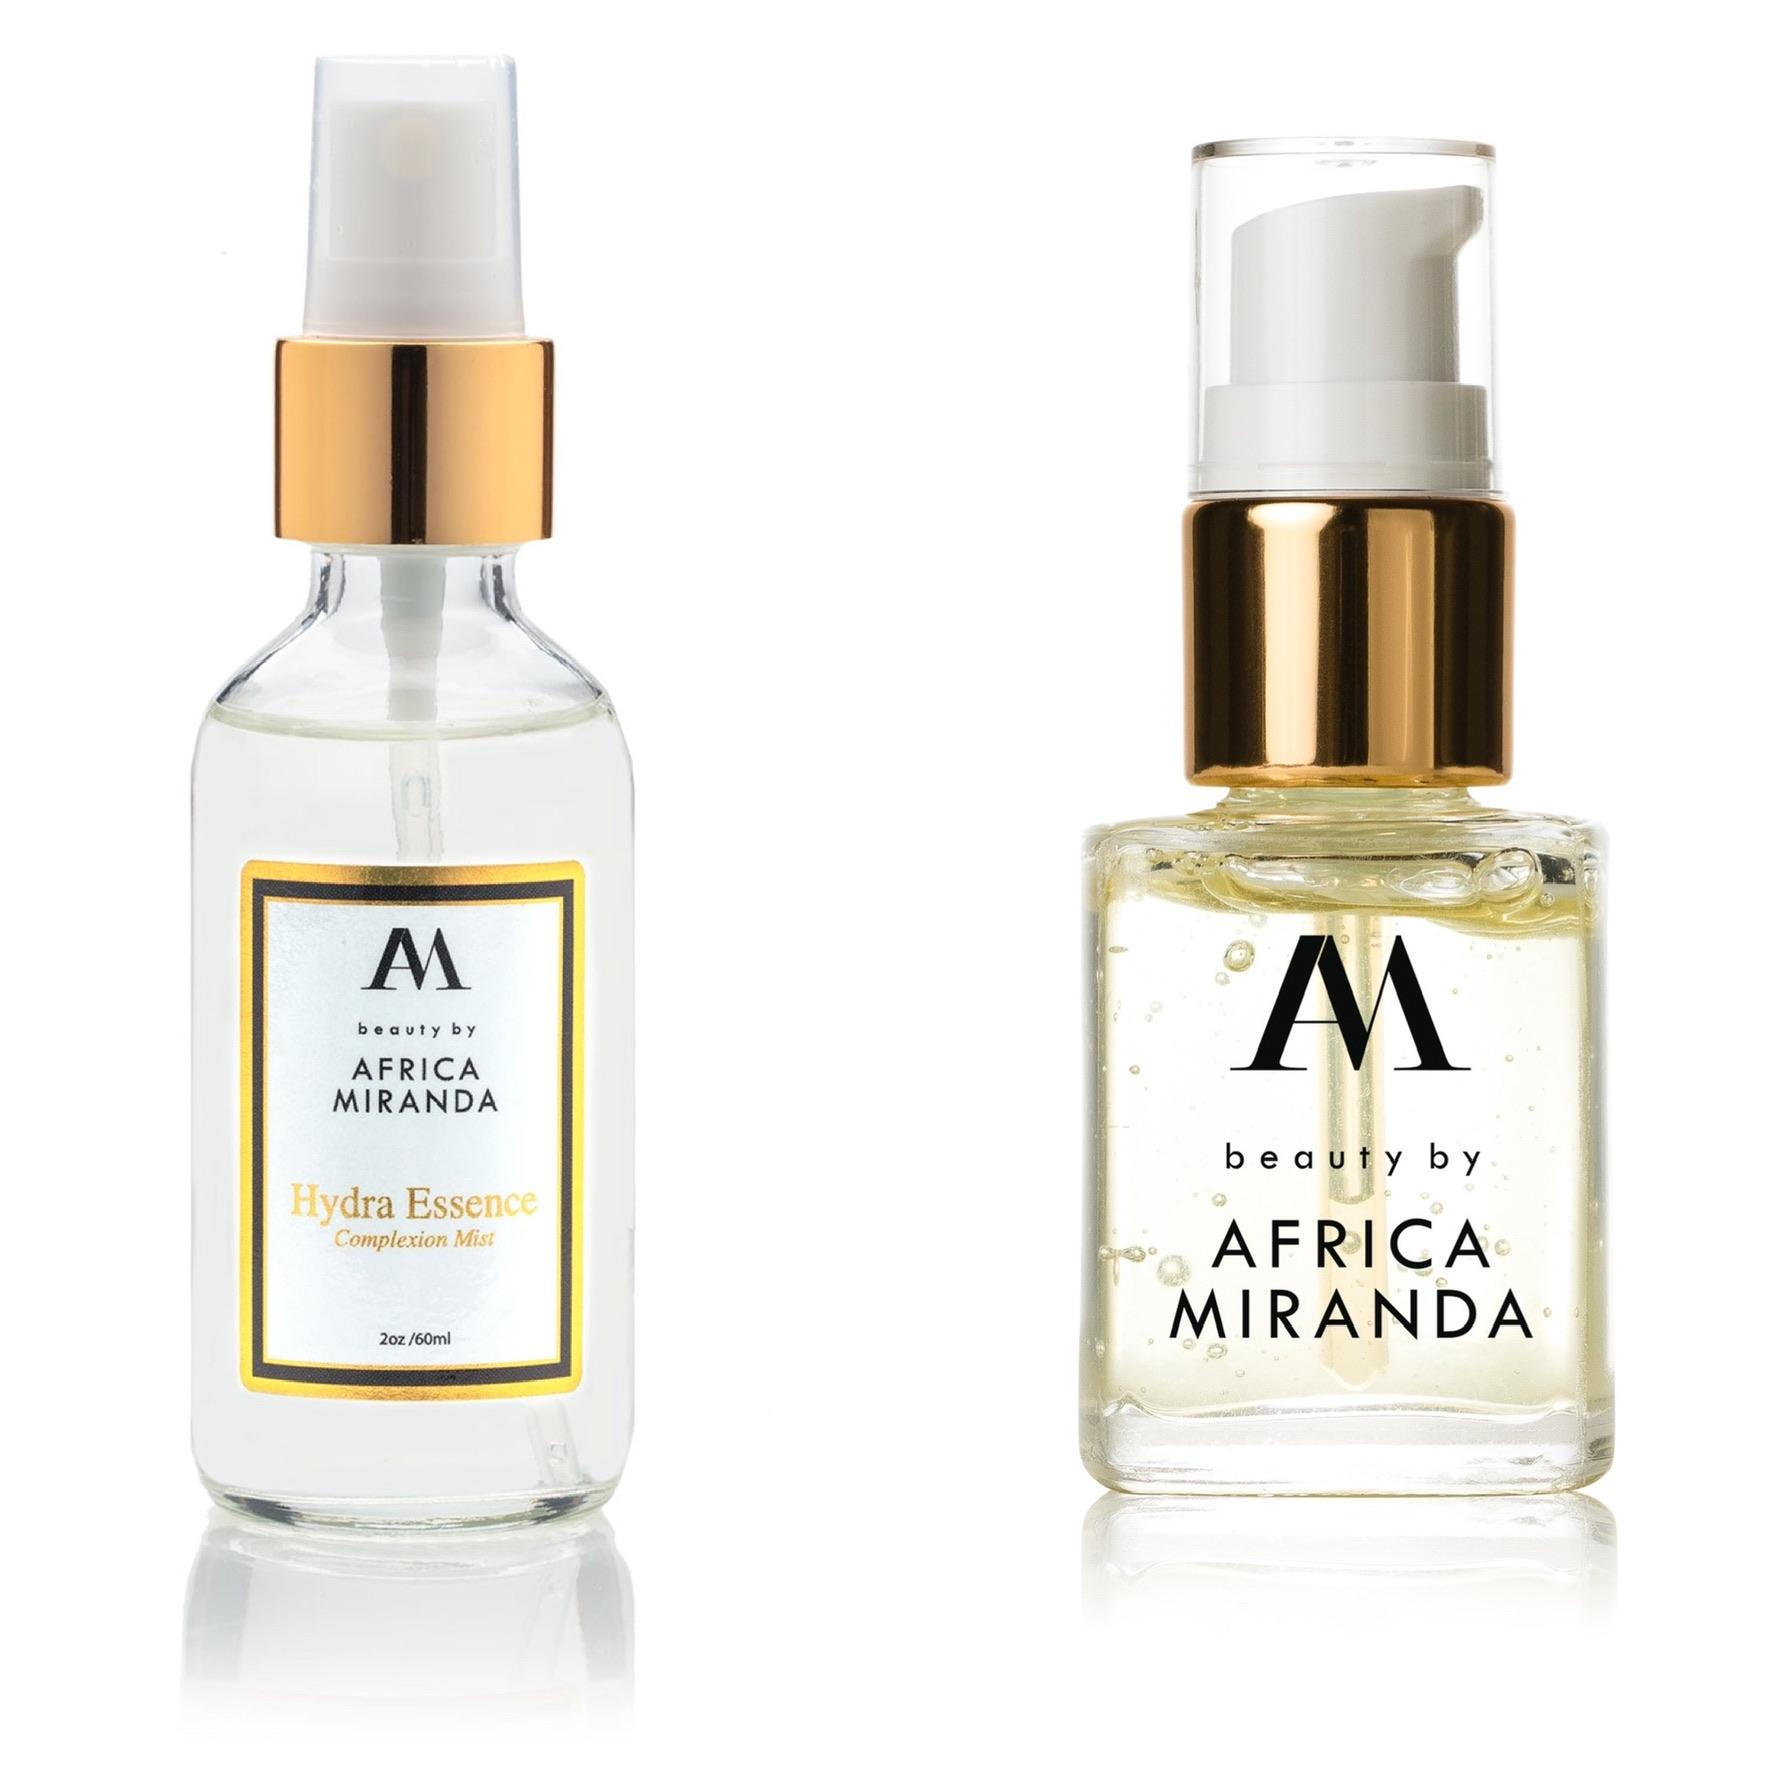 Africa Miranda